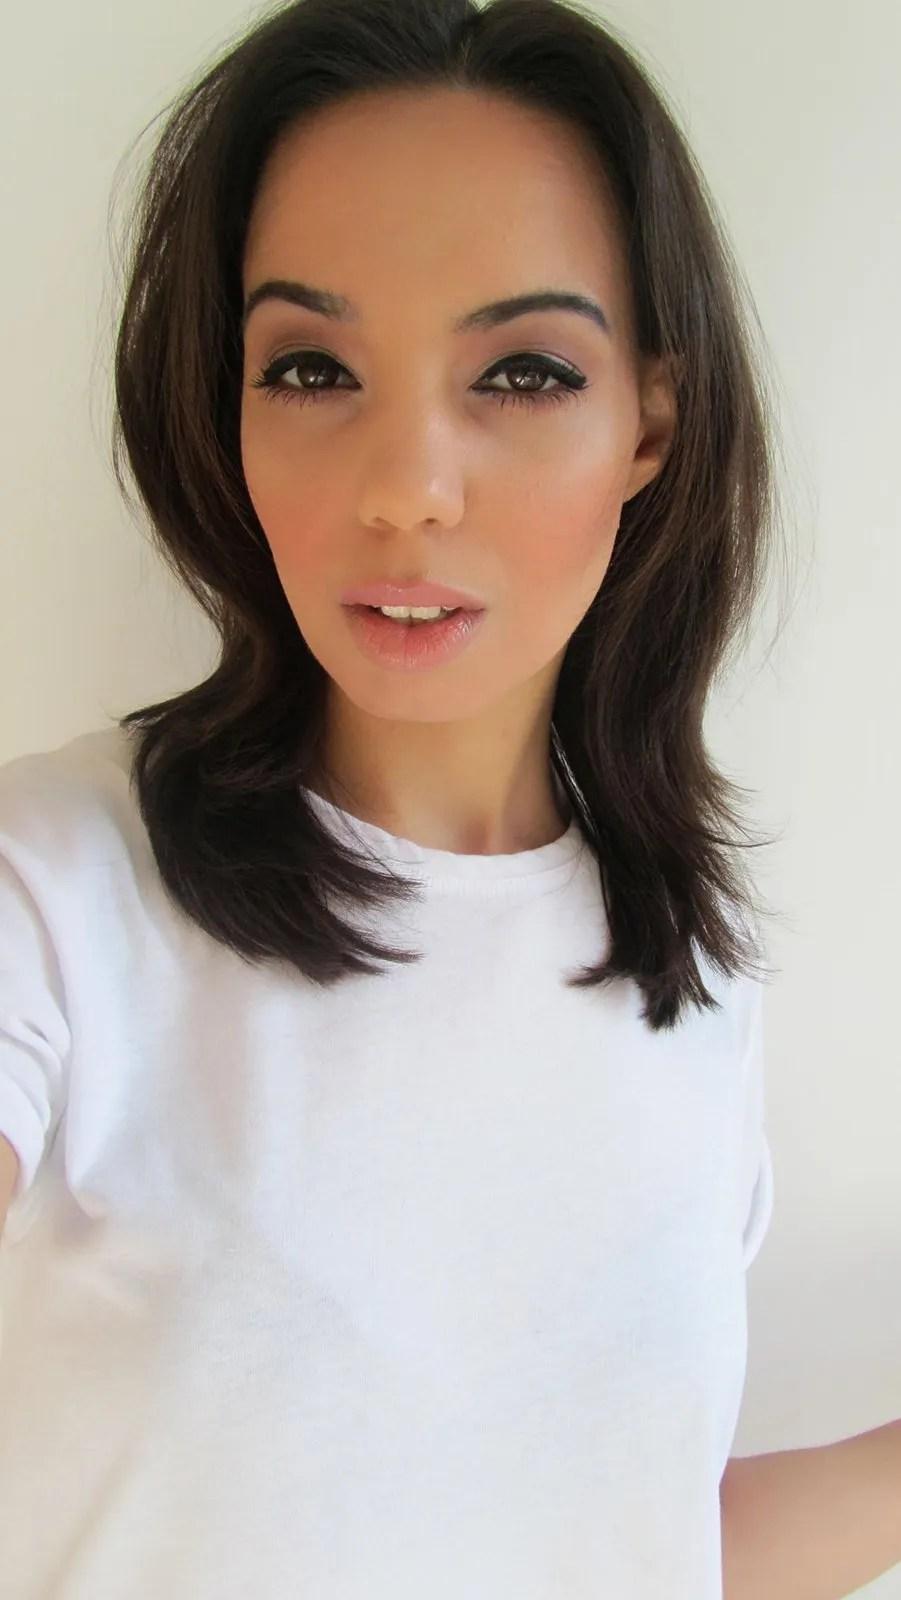 BeautyPlus_20170406165435_save.jpg